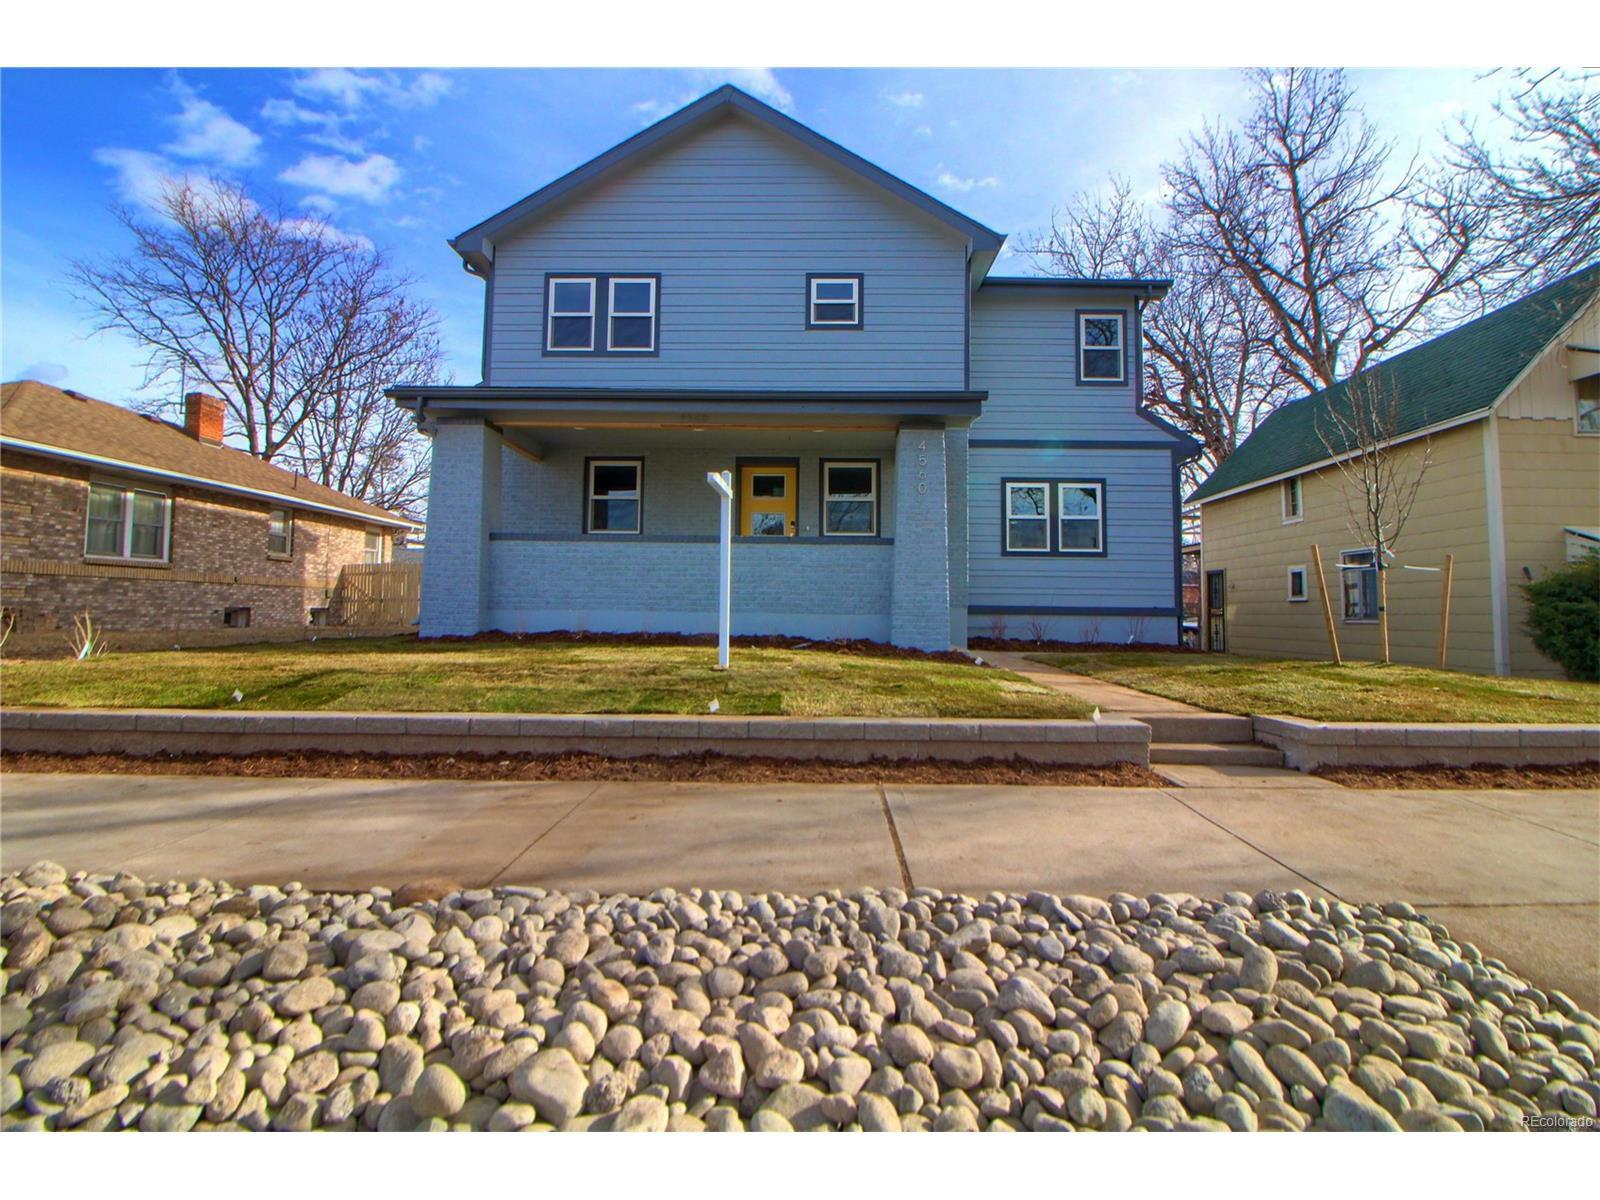 4560 Winona Ct, Denver, CO 80212 - Recently Sold | Trulia